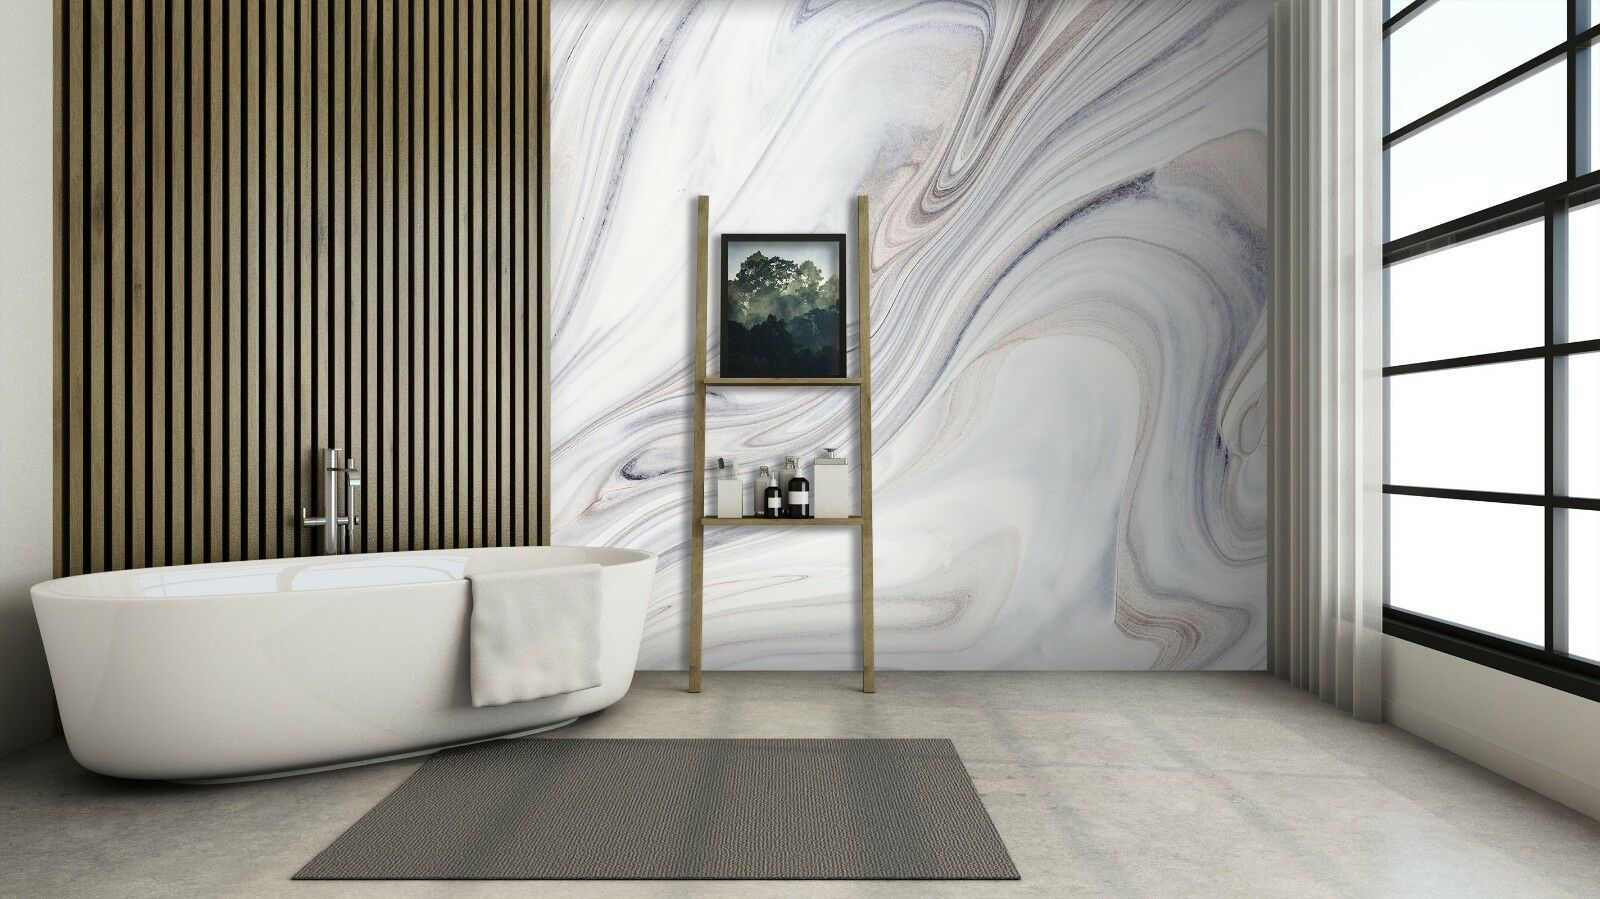 3D Abstraktes Weiß 2 Textur Fliesen Marmor Tapeten Abziehbild Tapete Wandbild